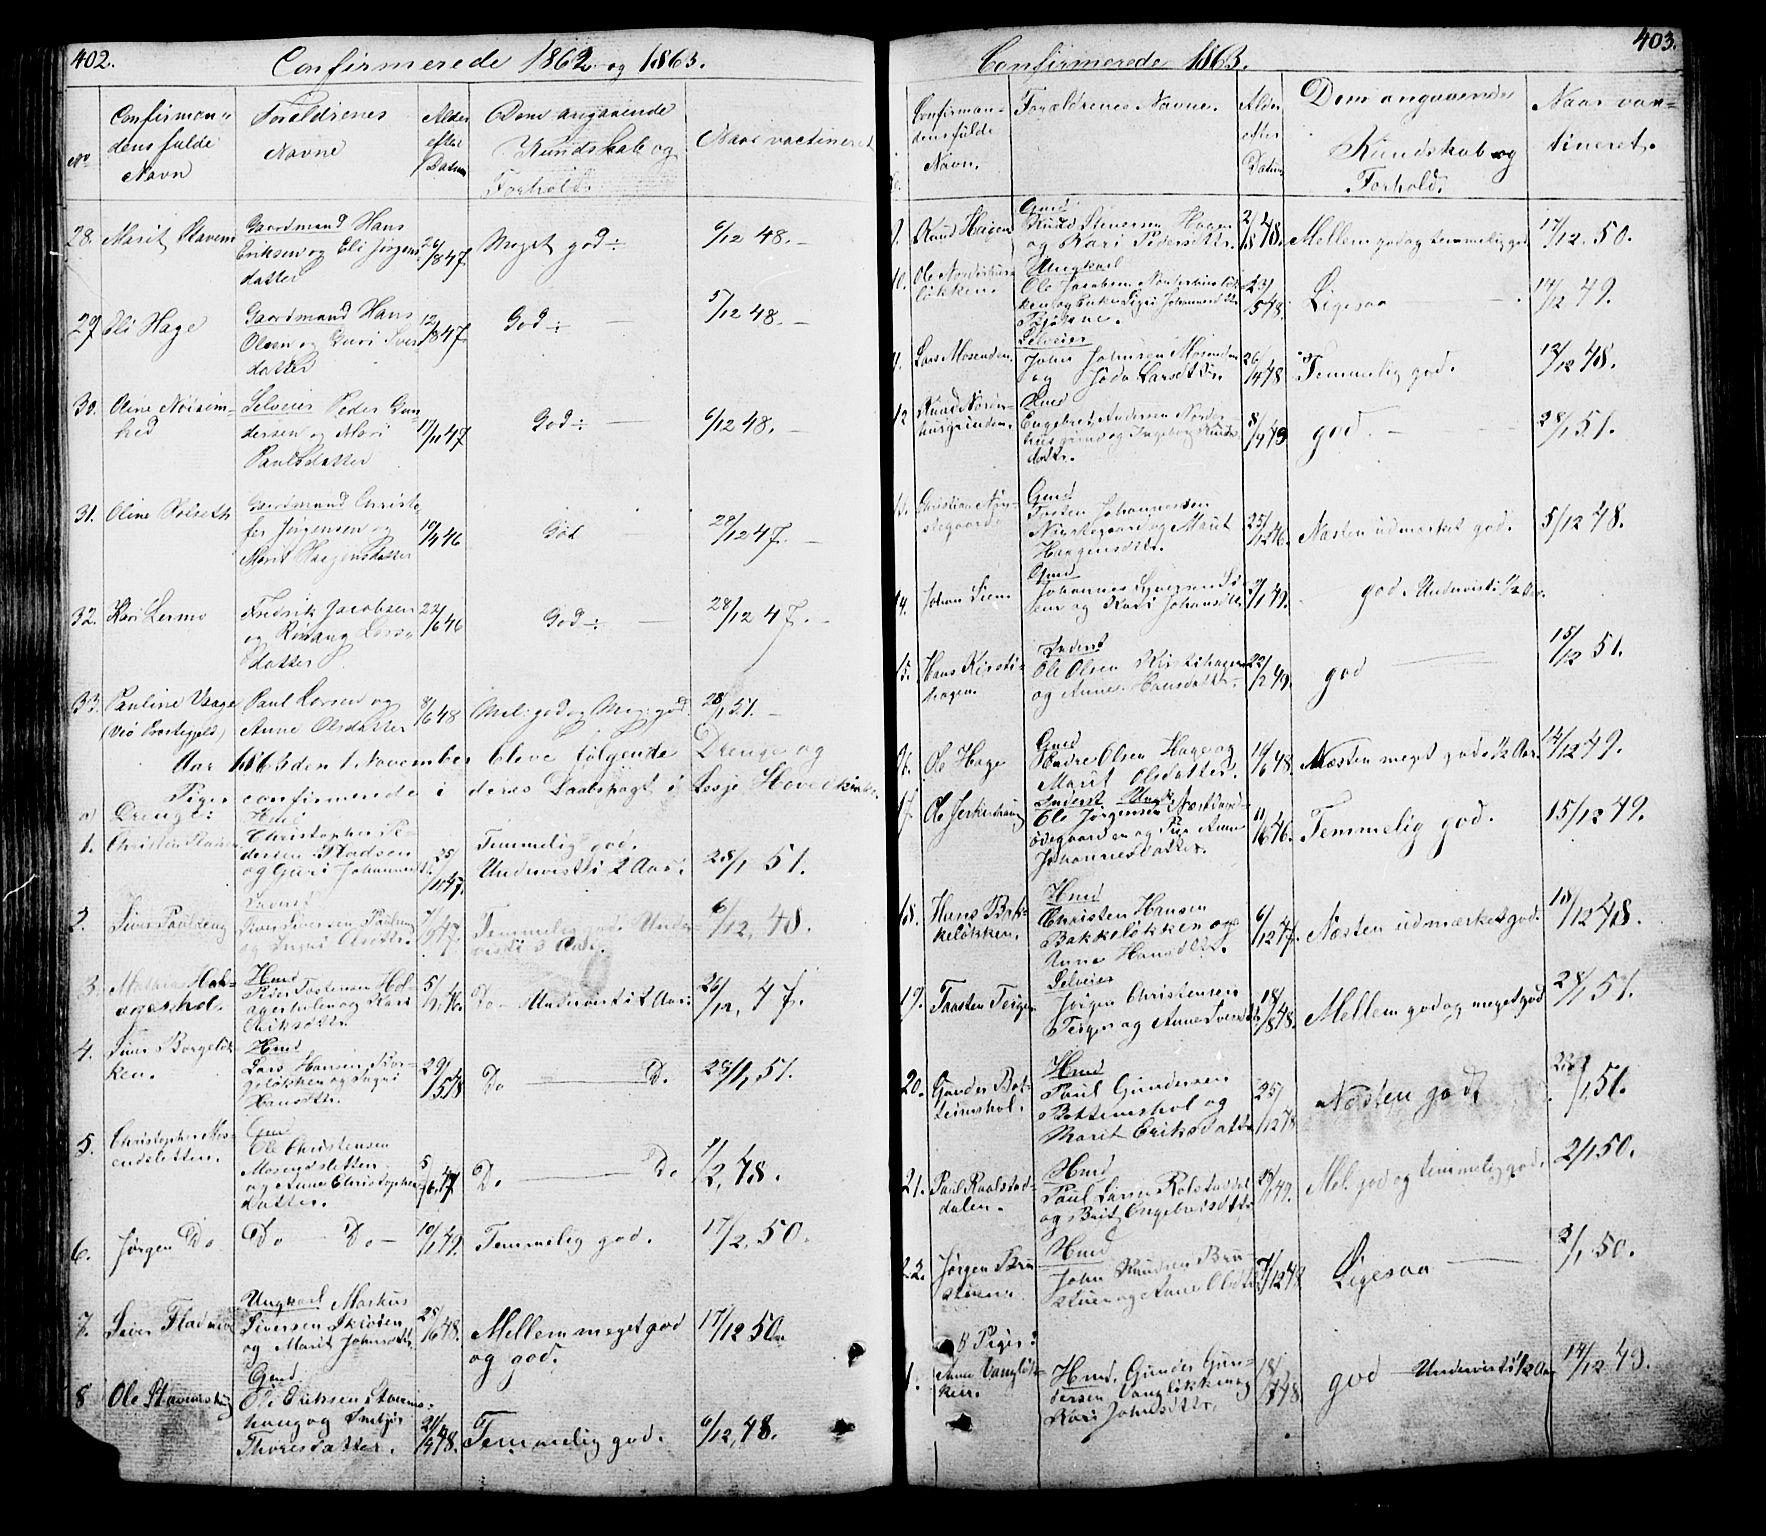 SAH, Lesja prestekontor, Klokkerbok nr. 5, 1850-1894, s. 402-403